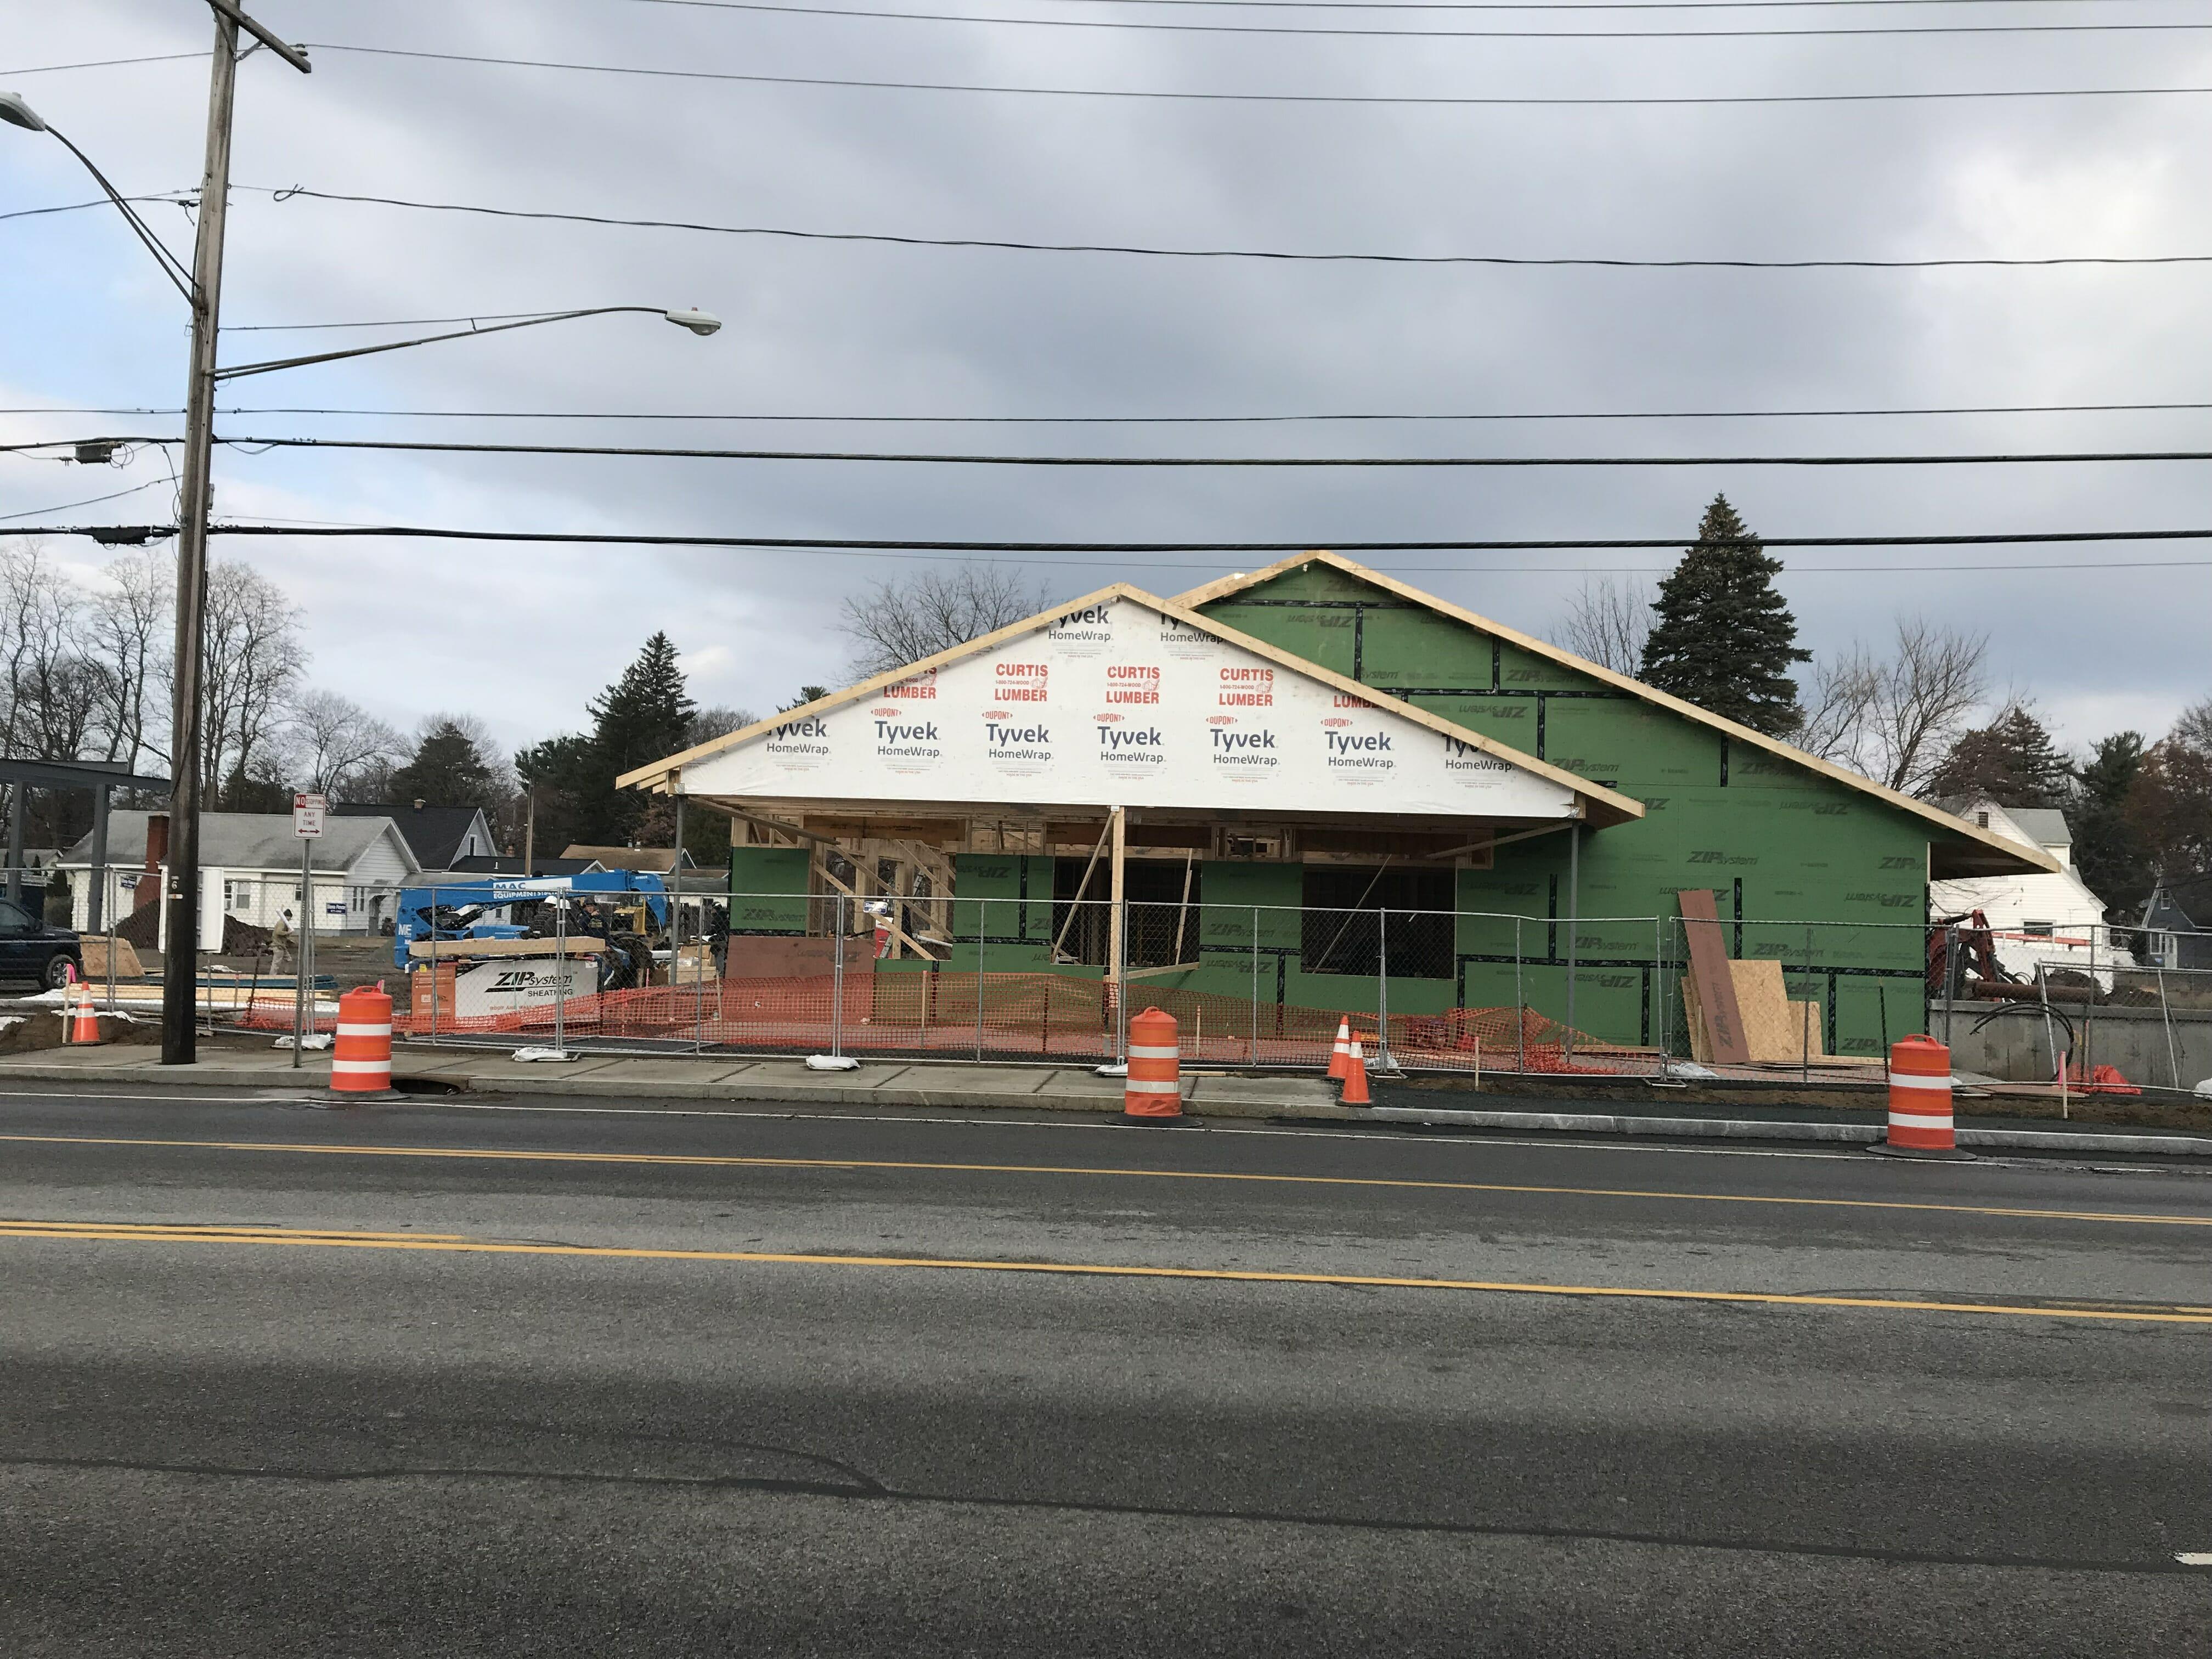 Fuller Rd Stewart's under construction